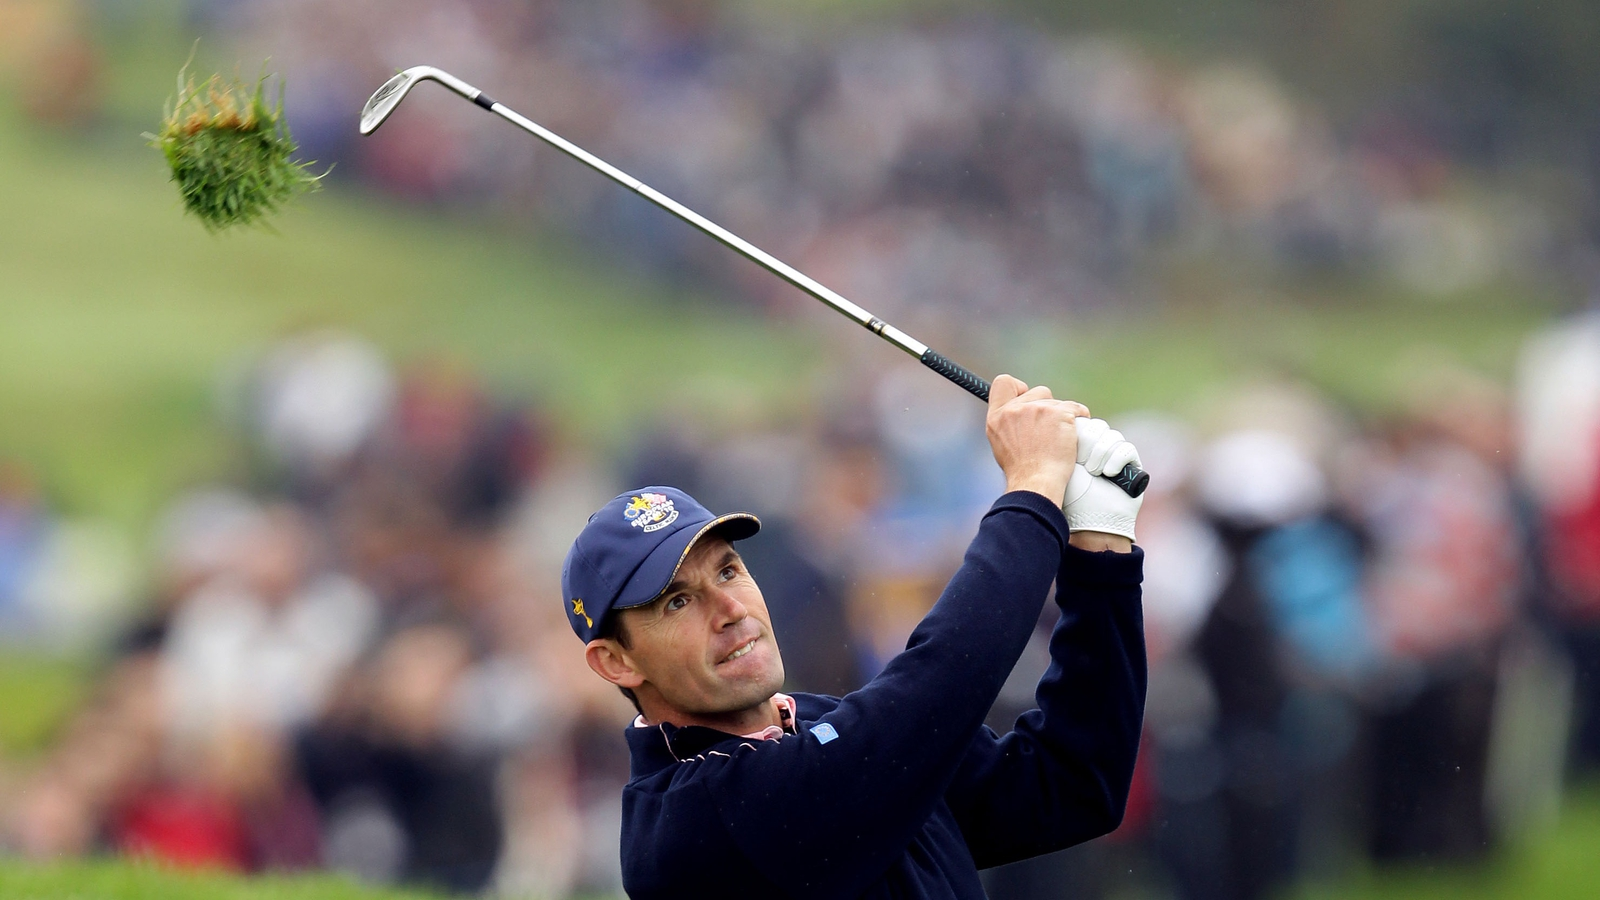 Harrington reveals major swing work